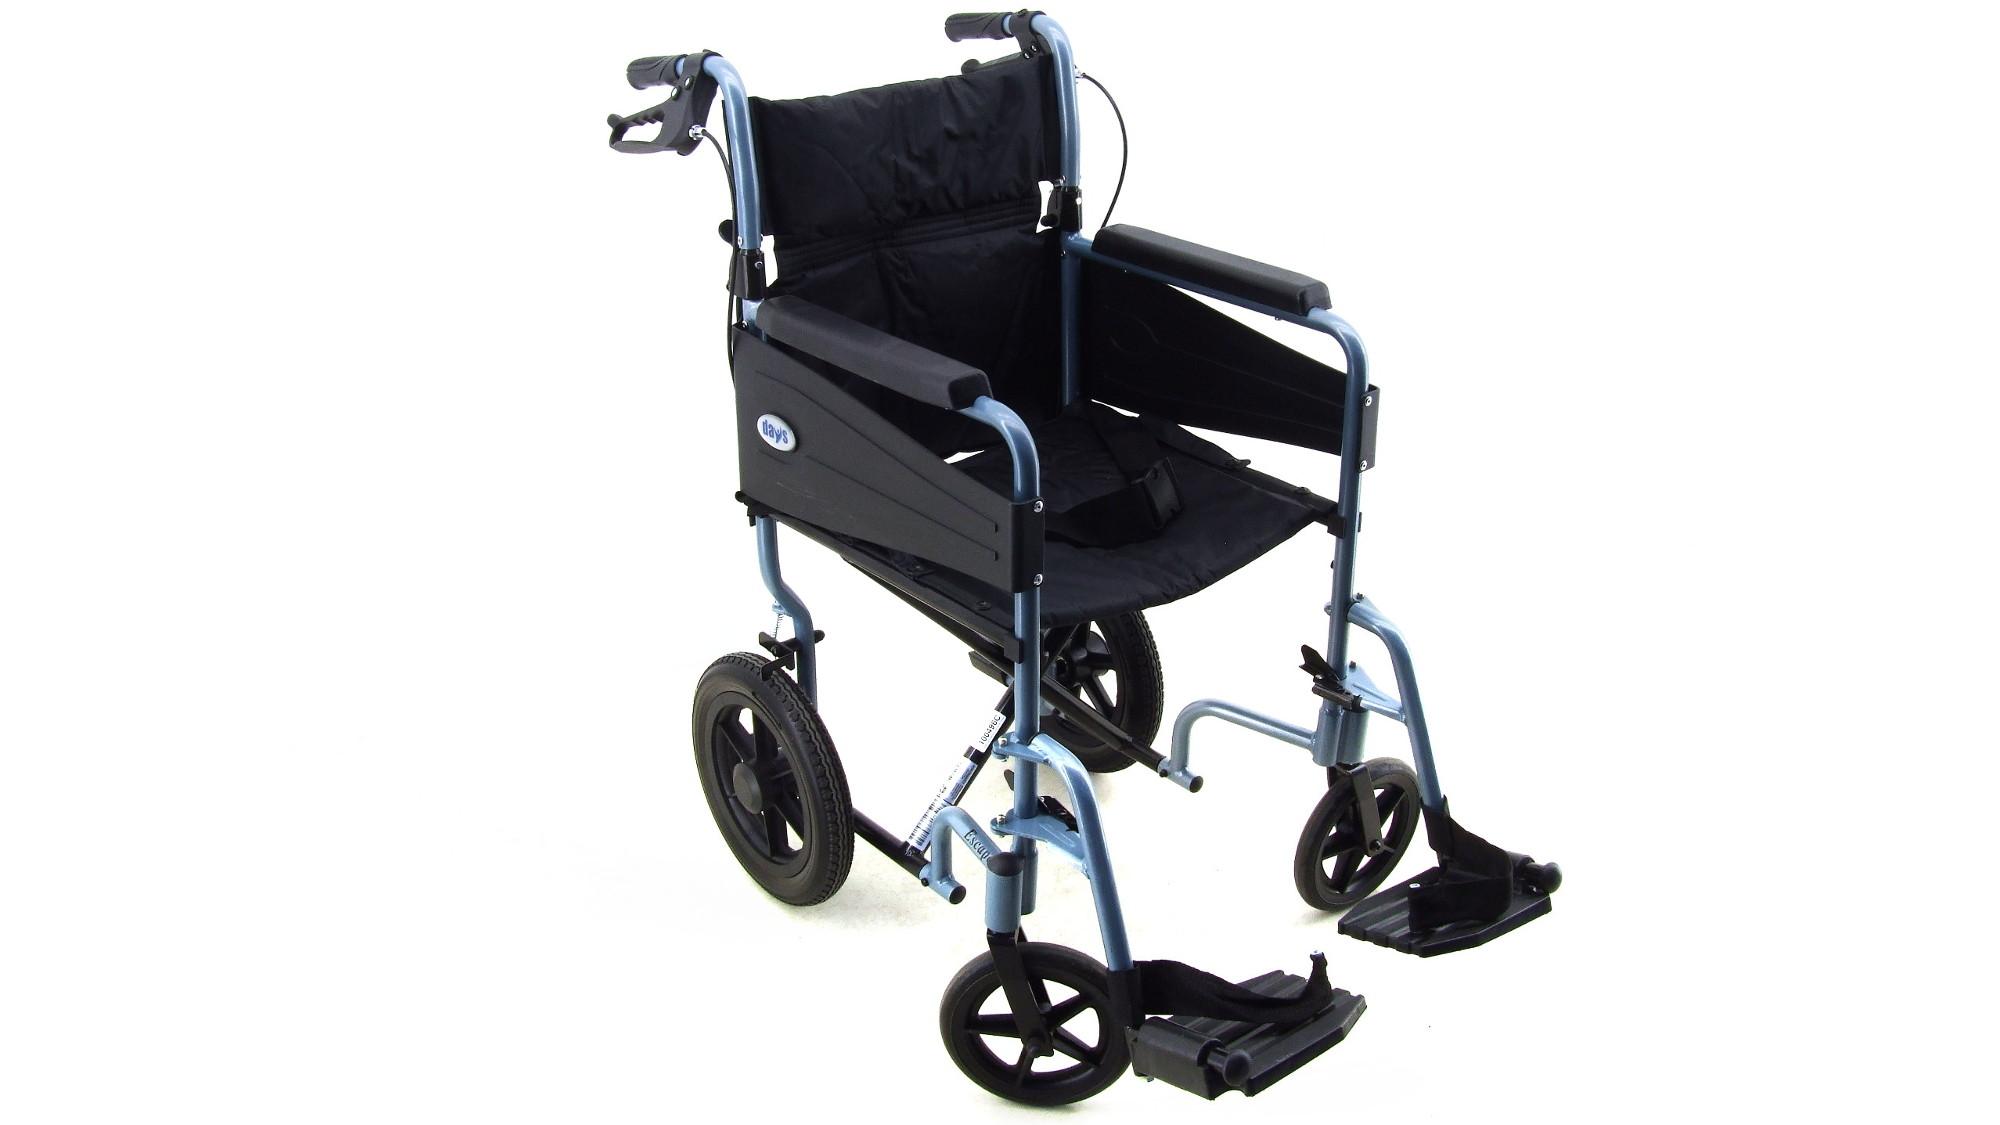 Rollstuhl leihen